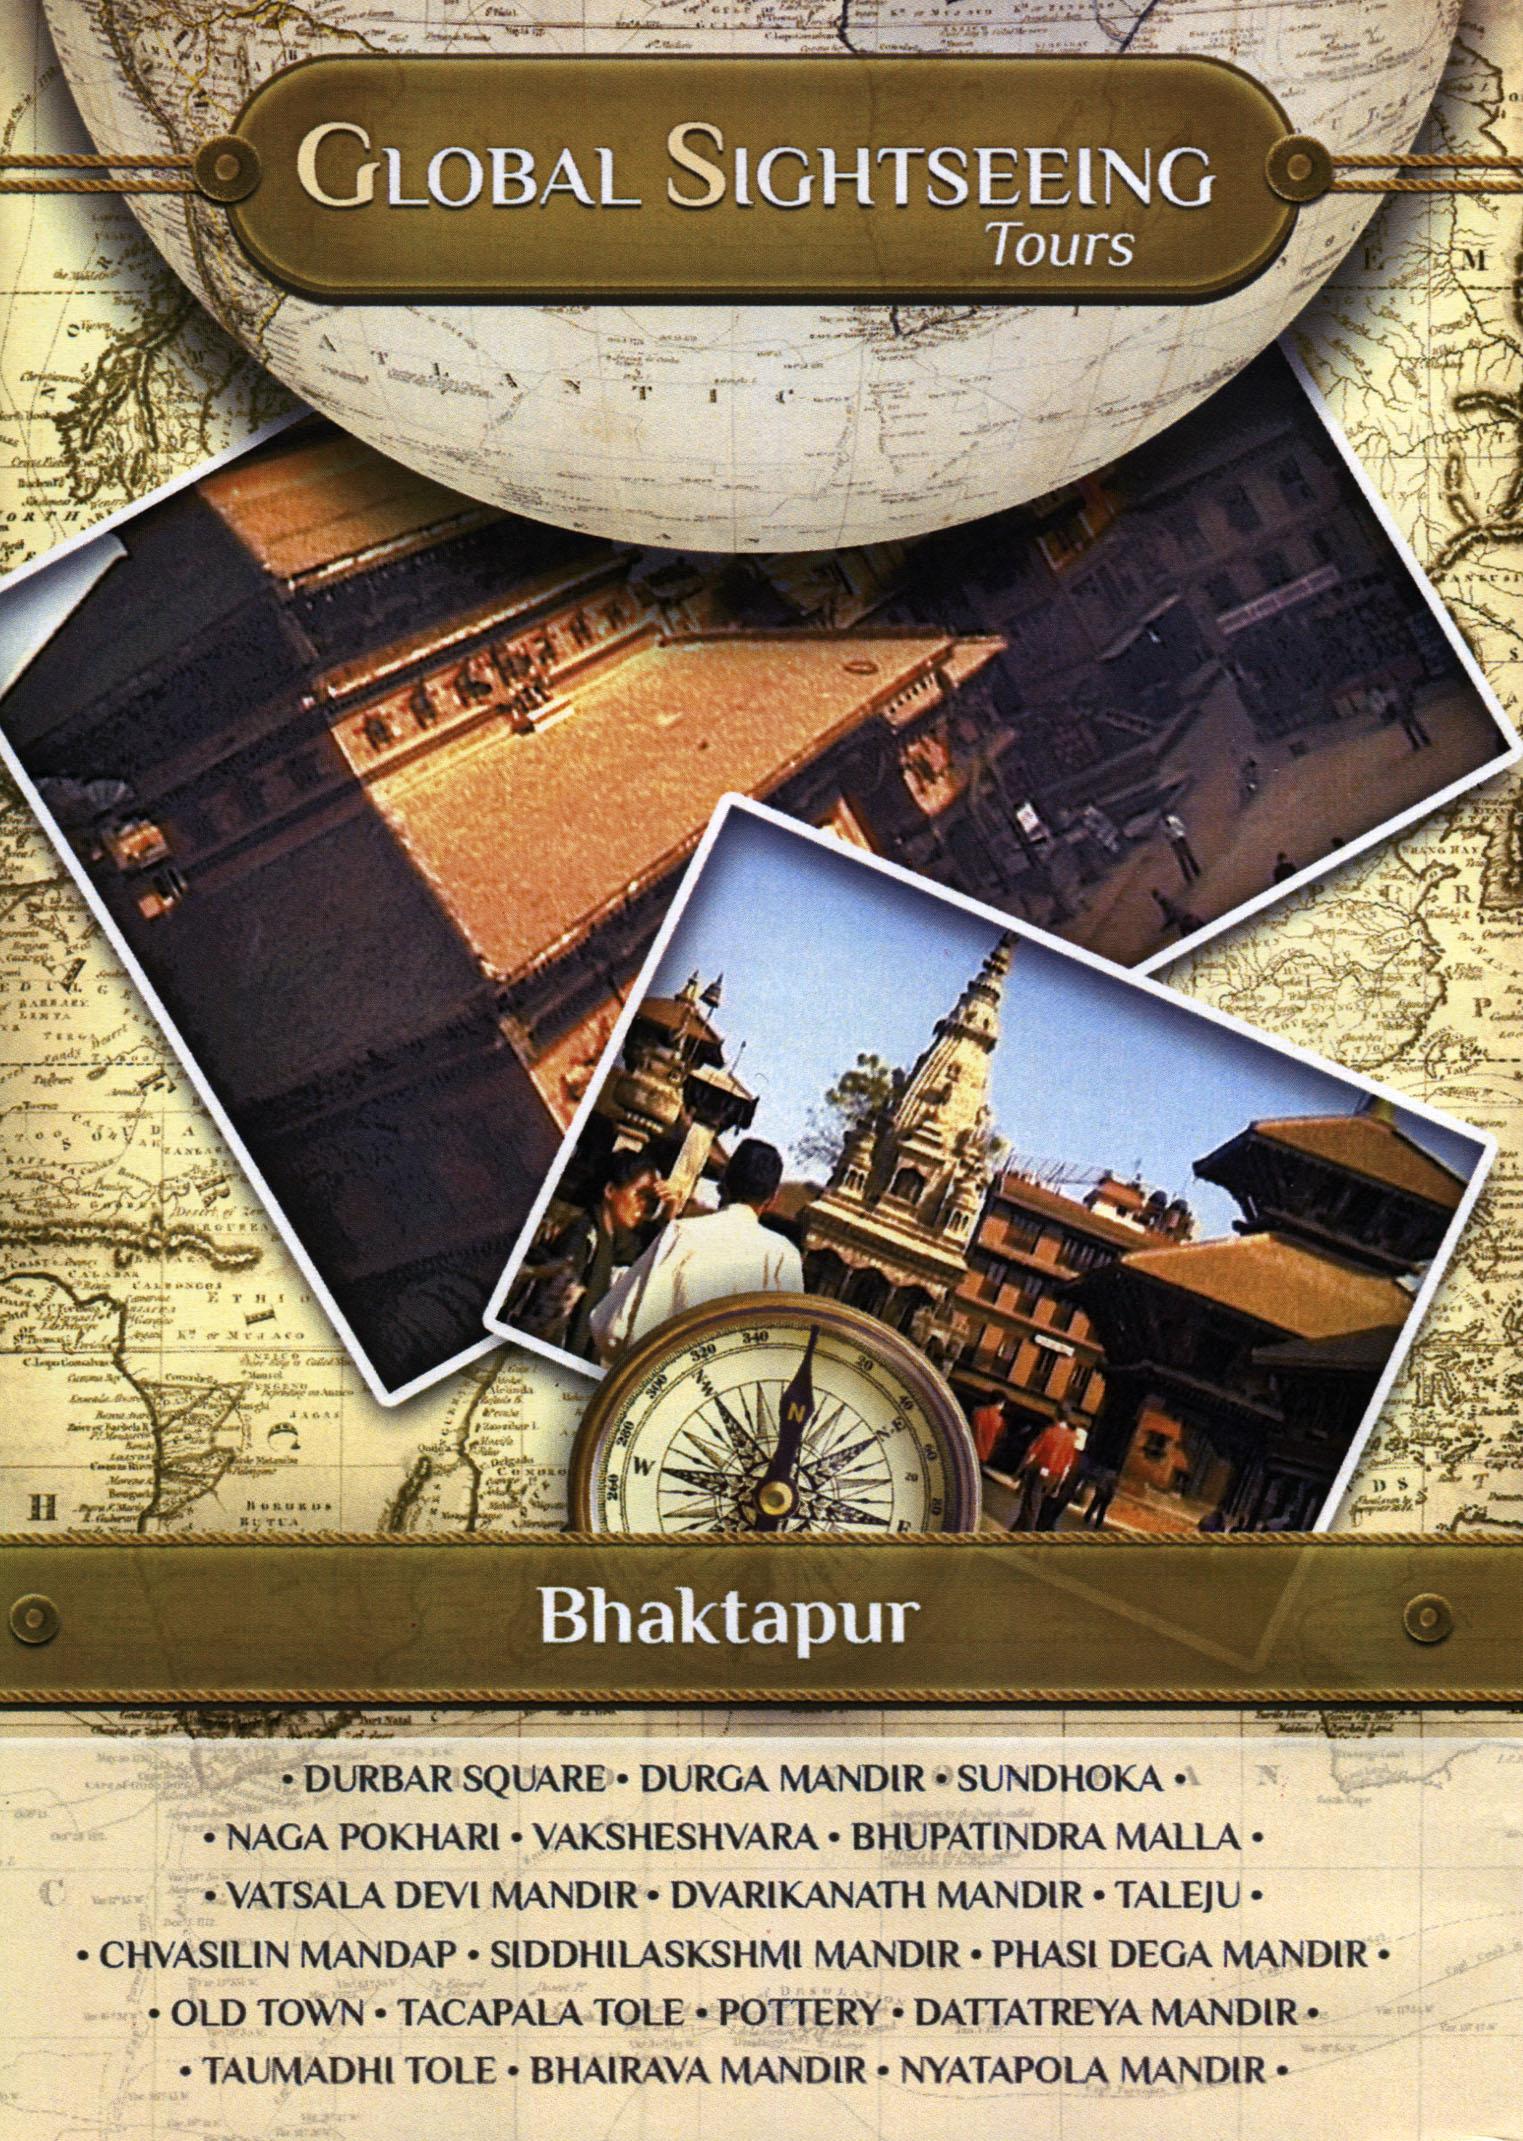 Global Sightseeing Tours: Bhaktapur